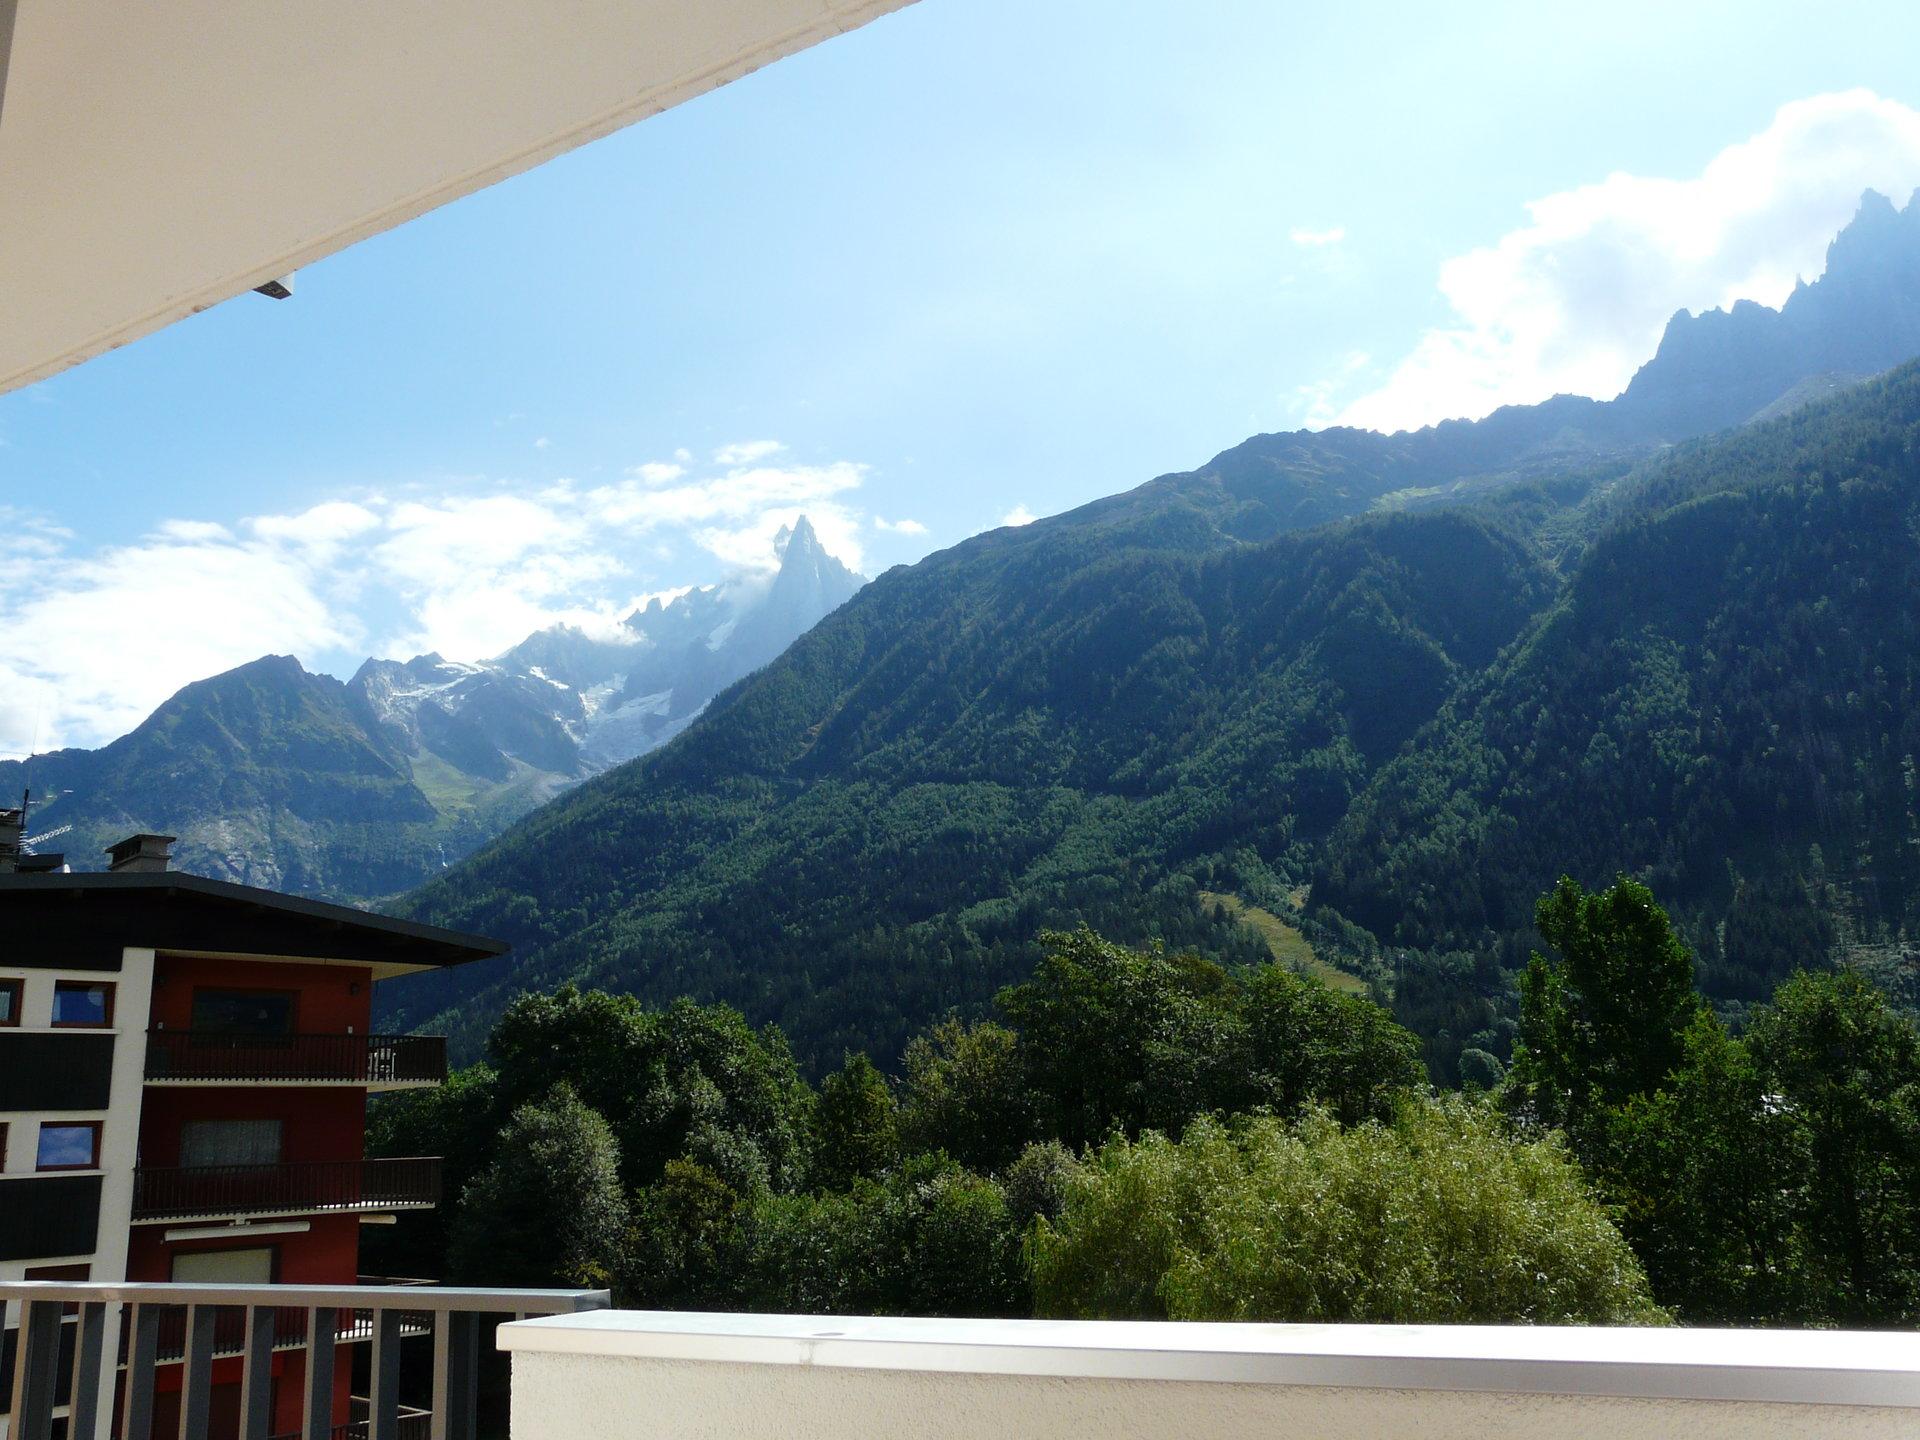 T3 Center Chamonix